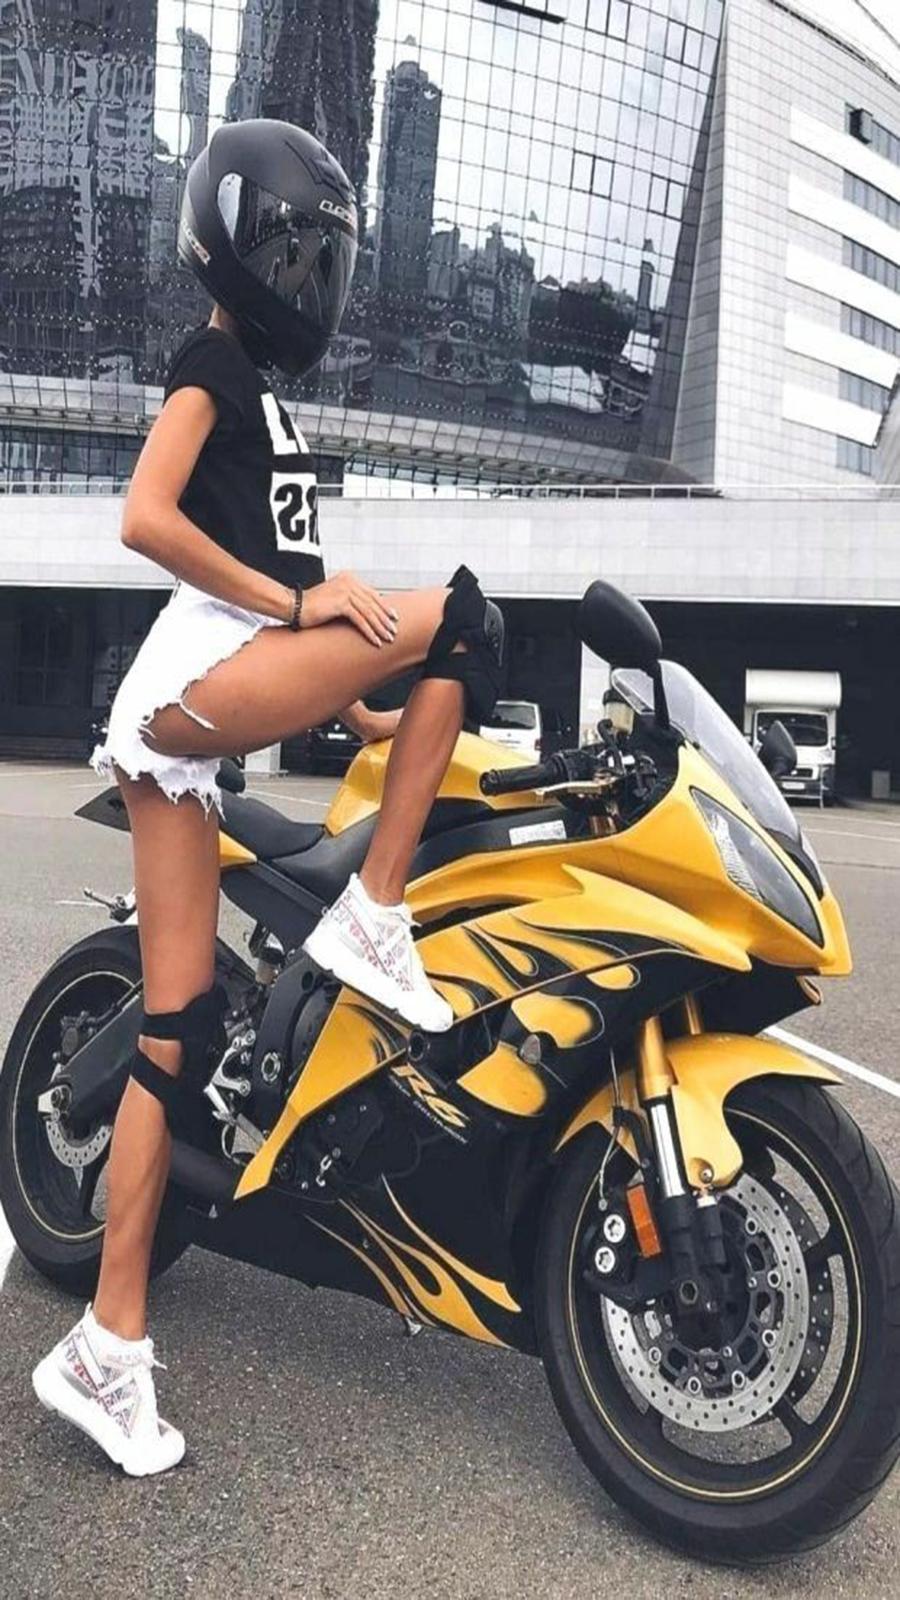 Best Girl Super Bike Wallpapers Free Download